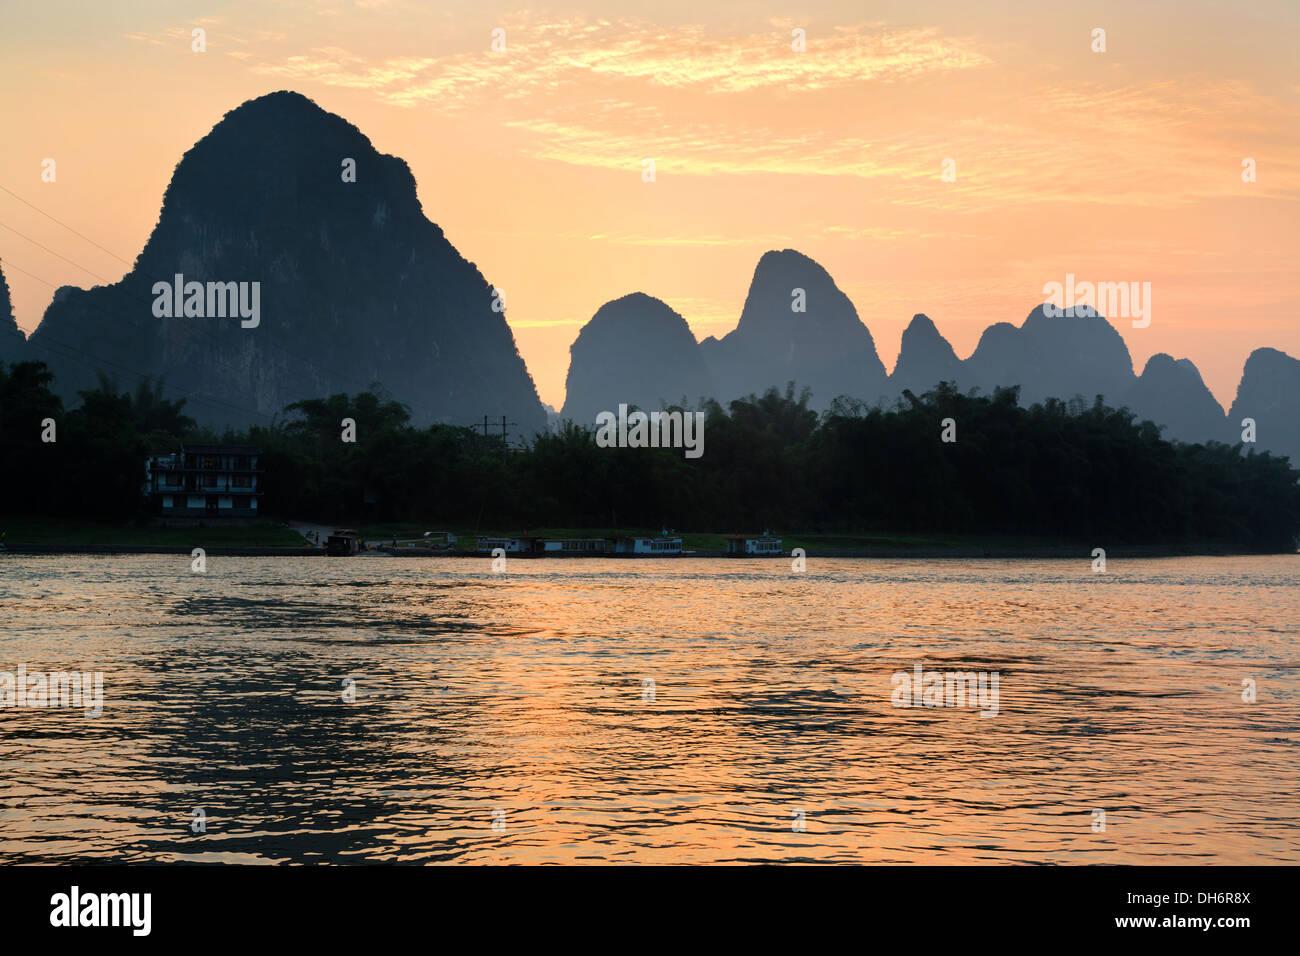 Sunset on the Li River near Xingpin village in China Stock Photo